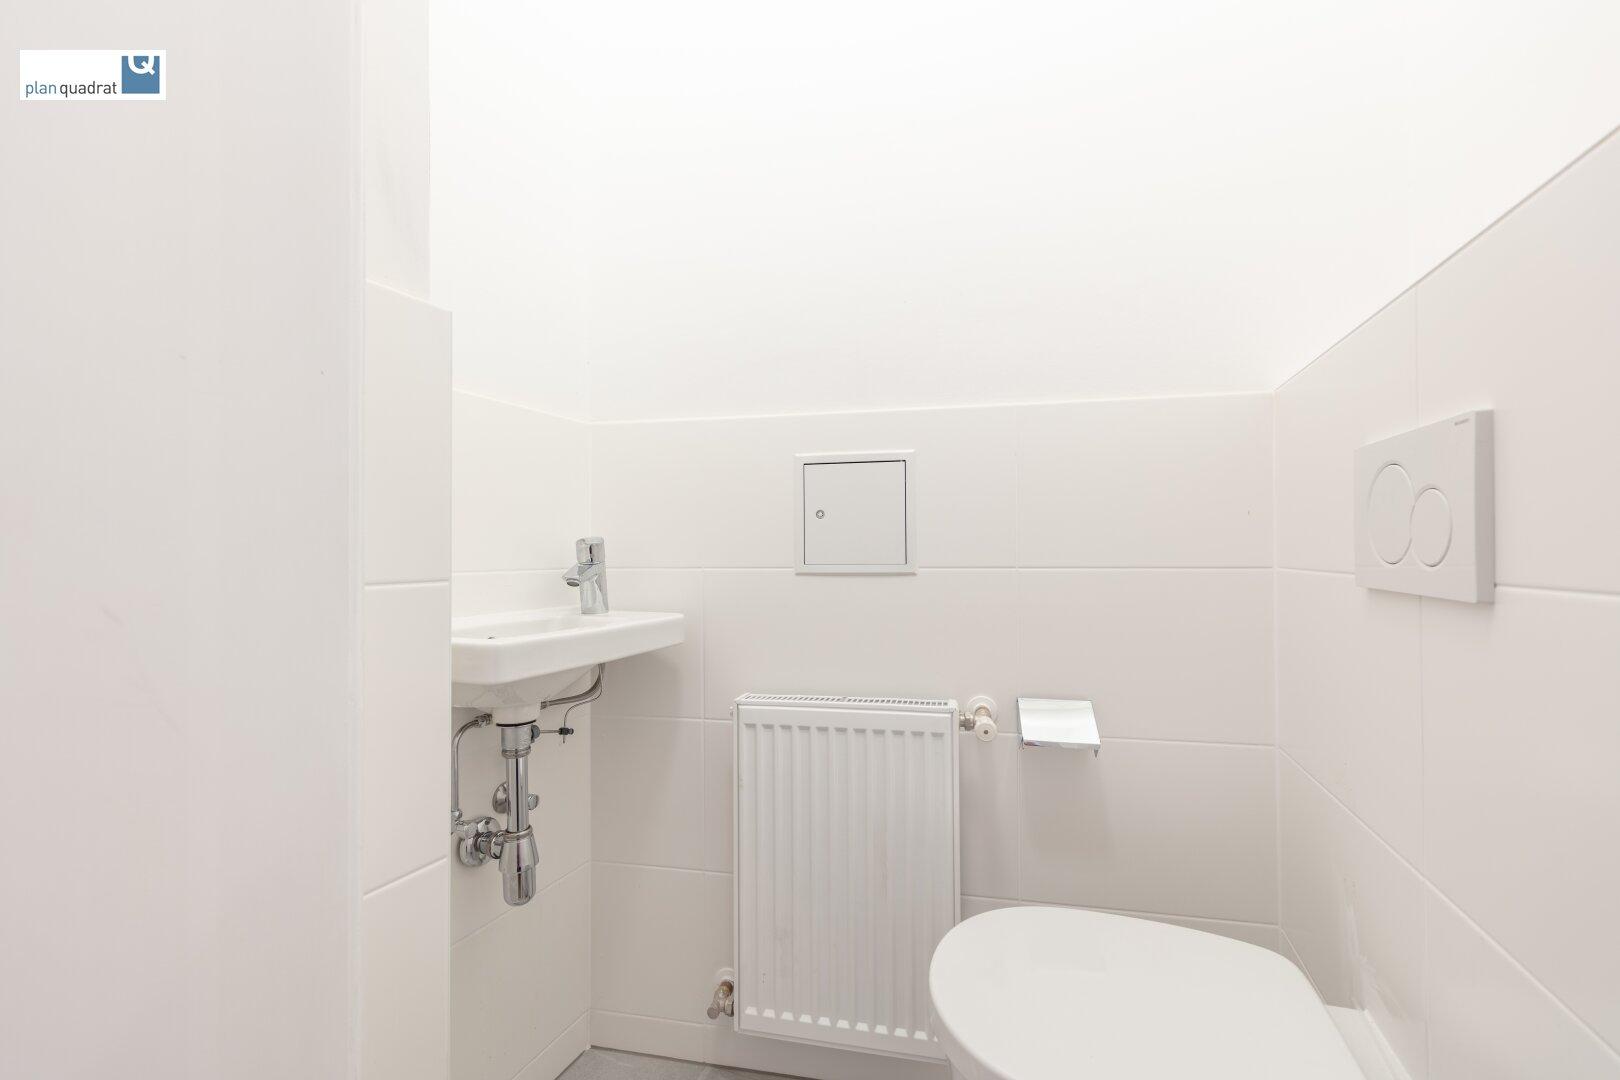 Toilette (neben Badezimmer - gem. Grundrissskizze)